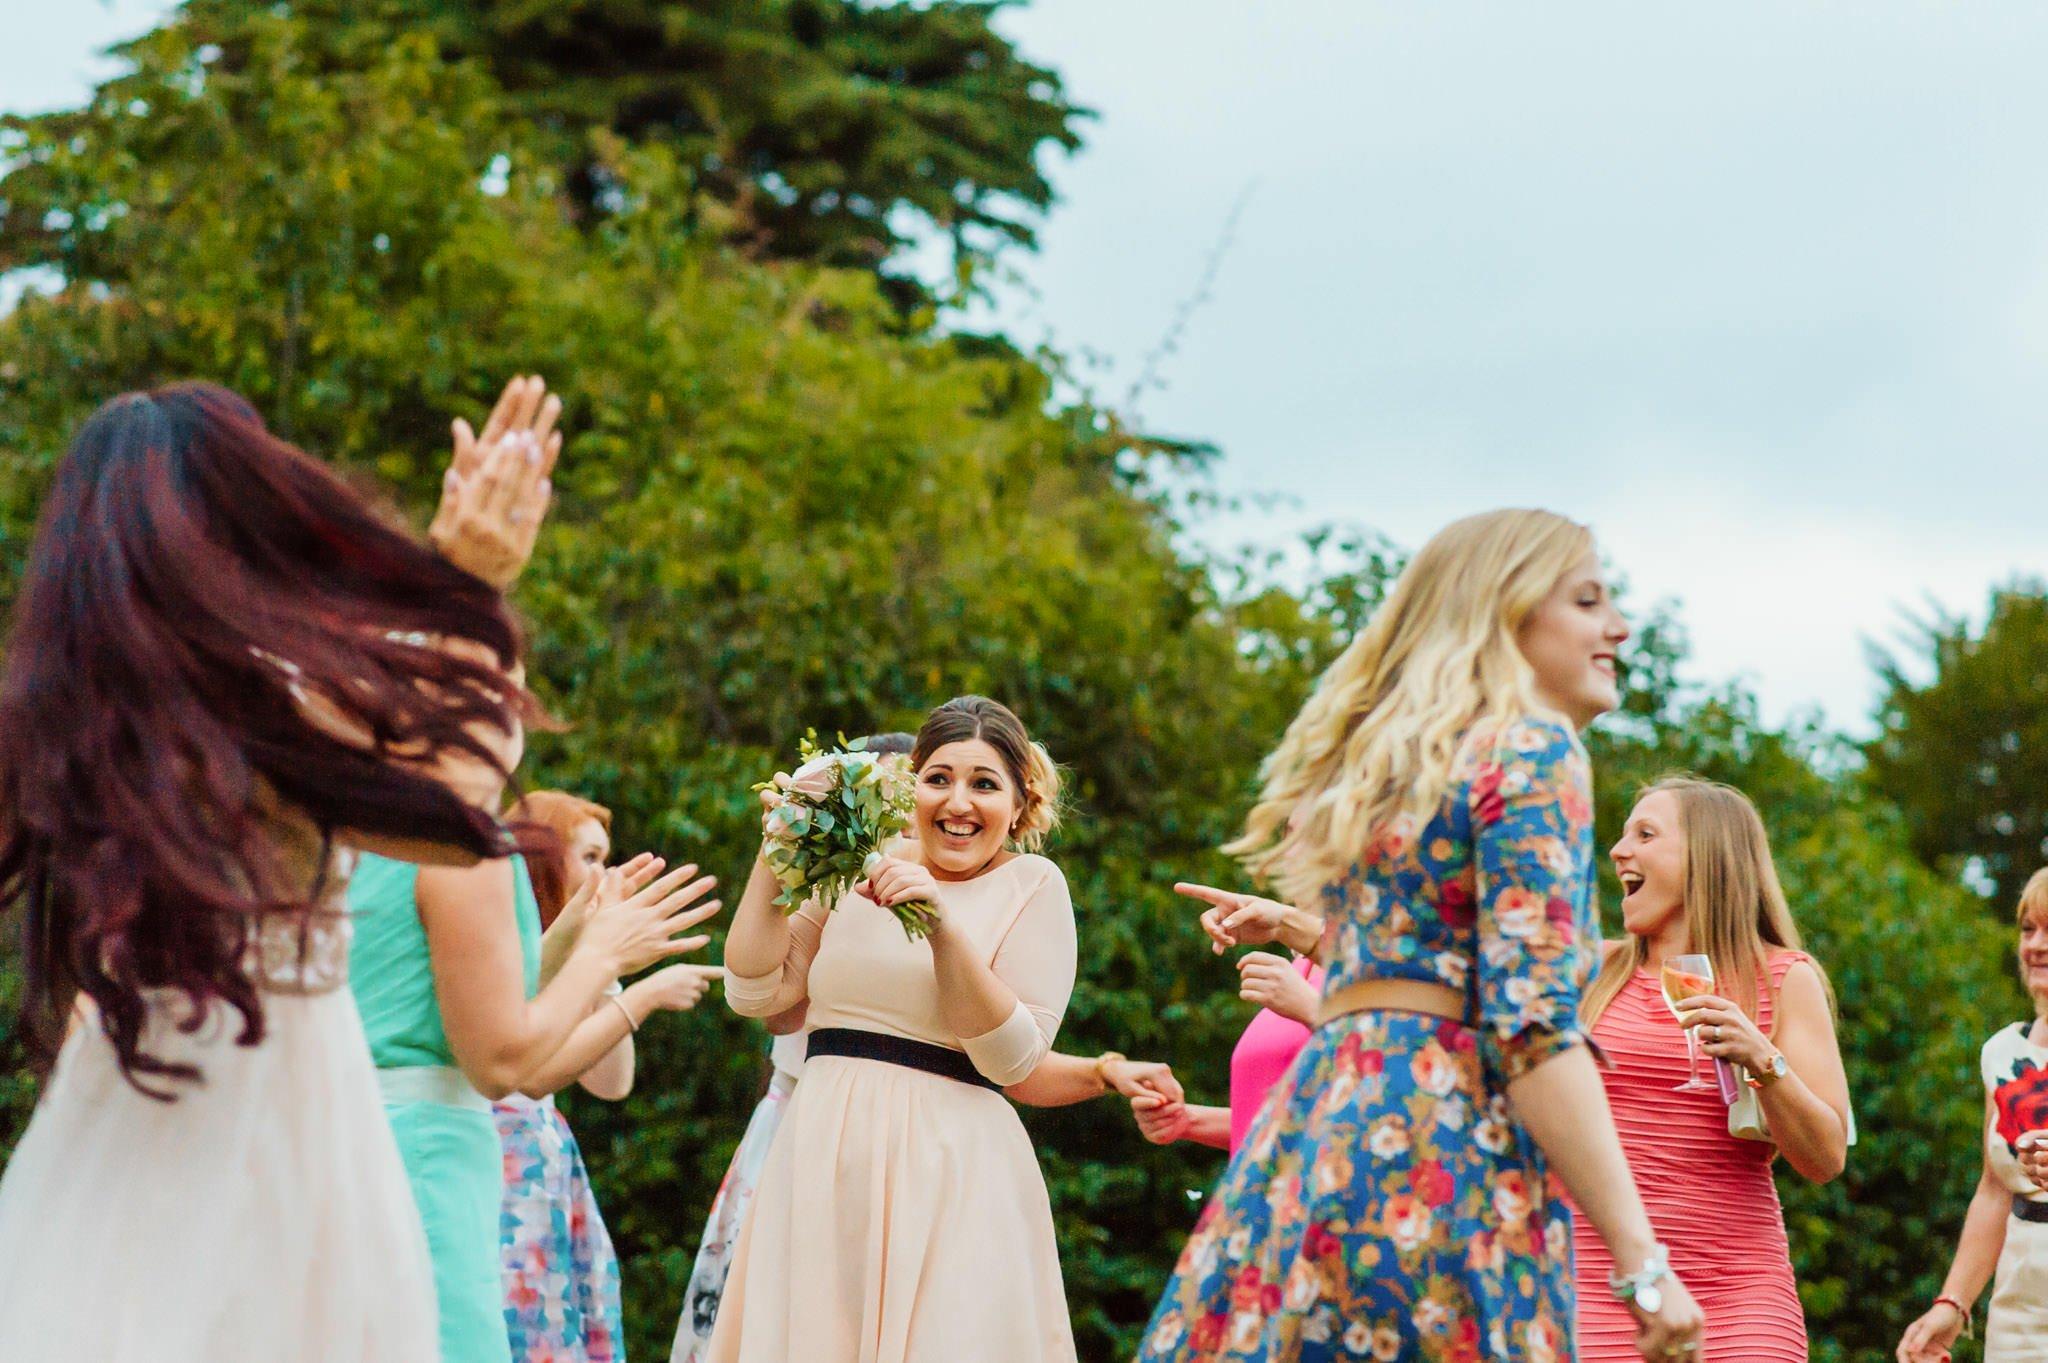 Eastnor Castle wedding photographer Herefordshire, West Midlands - Sarah + Dean 61